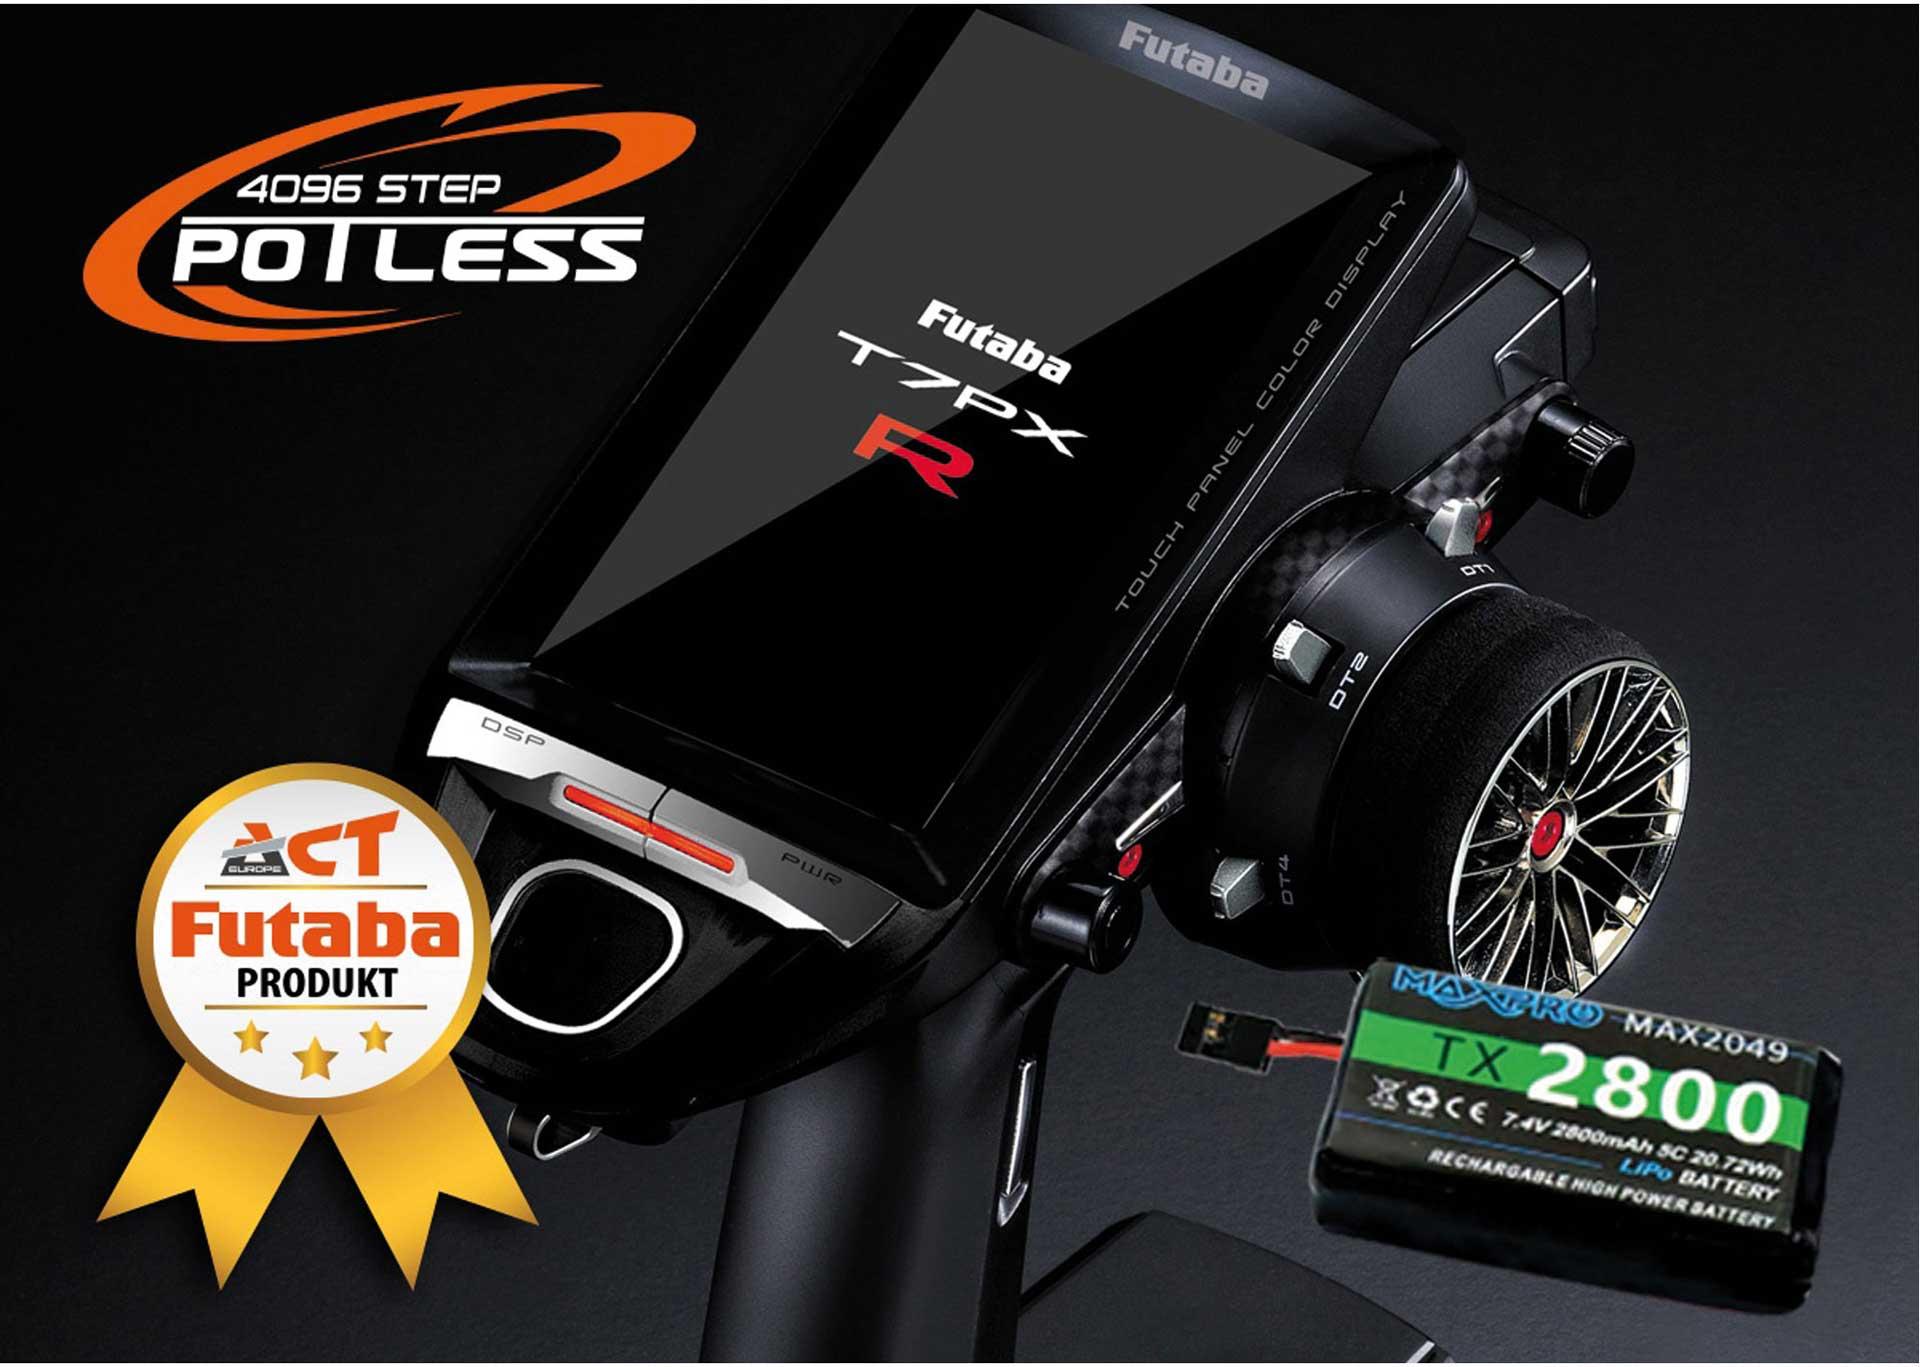 Futaba T7PXR Potless V3 + R334SBS + LiPo 2800mAh + Charger